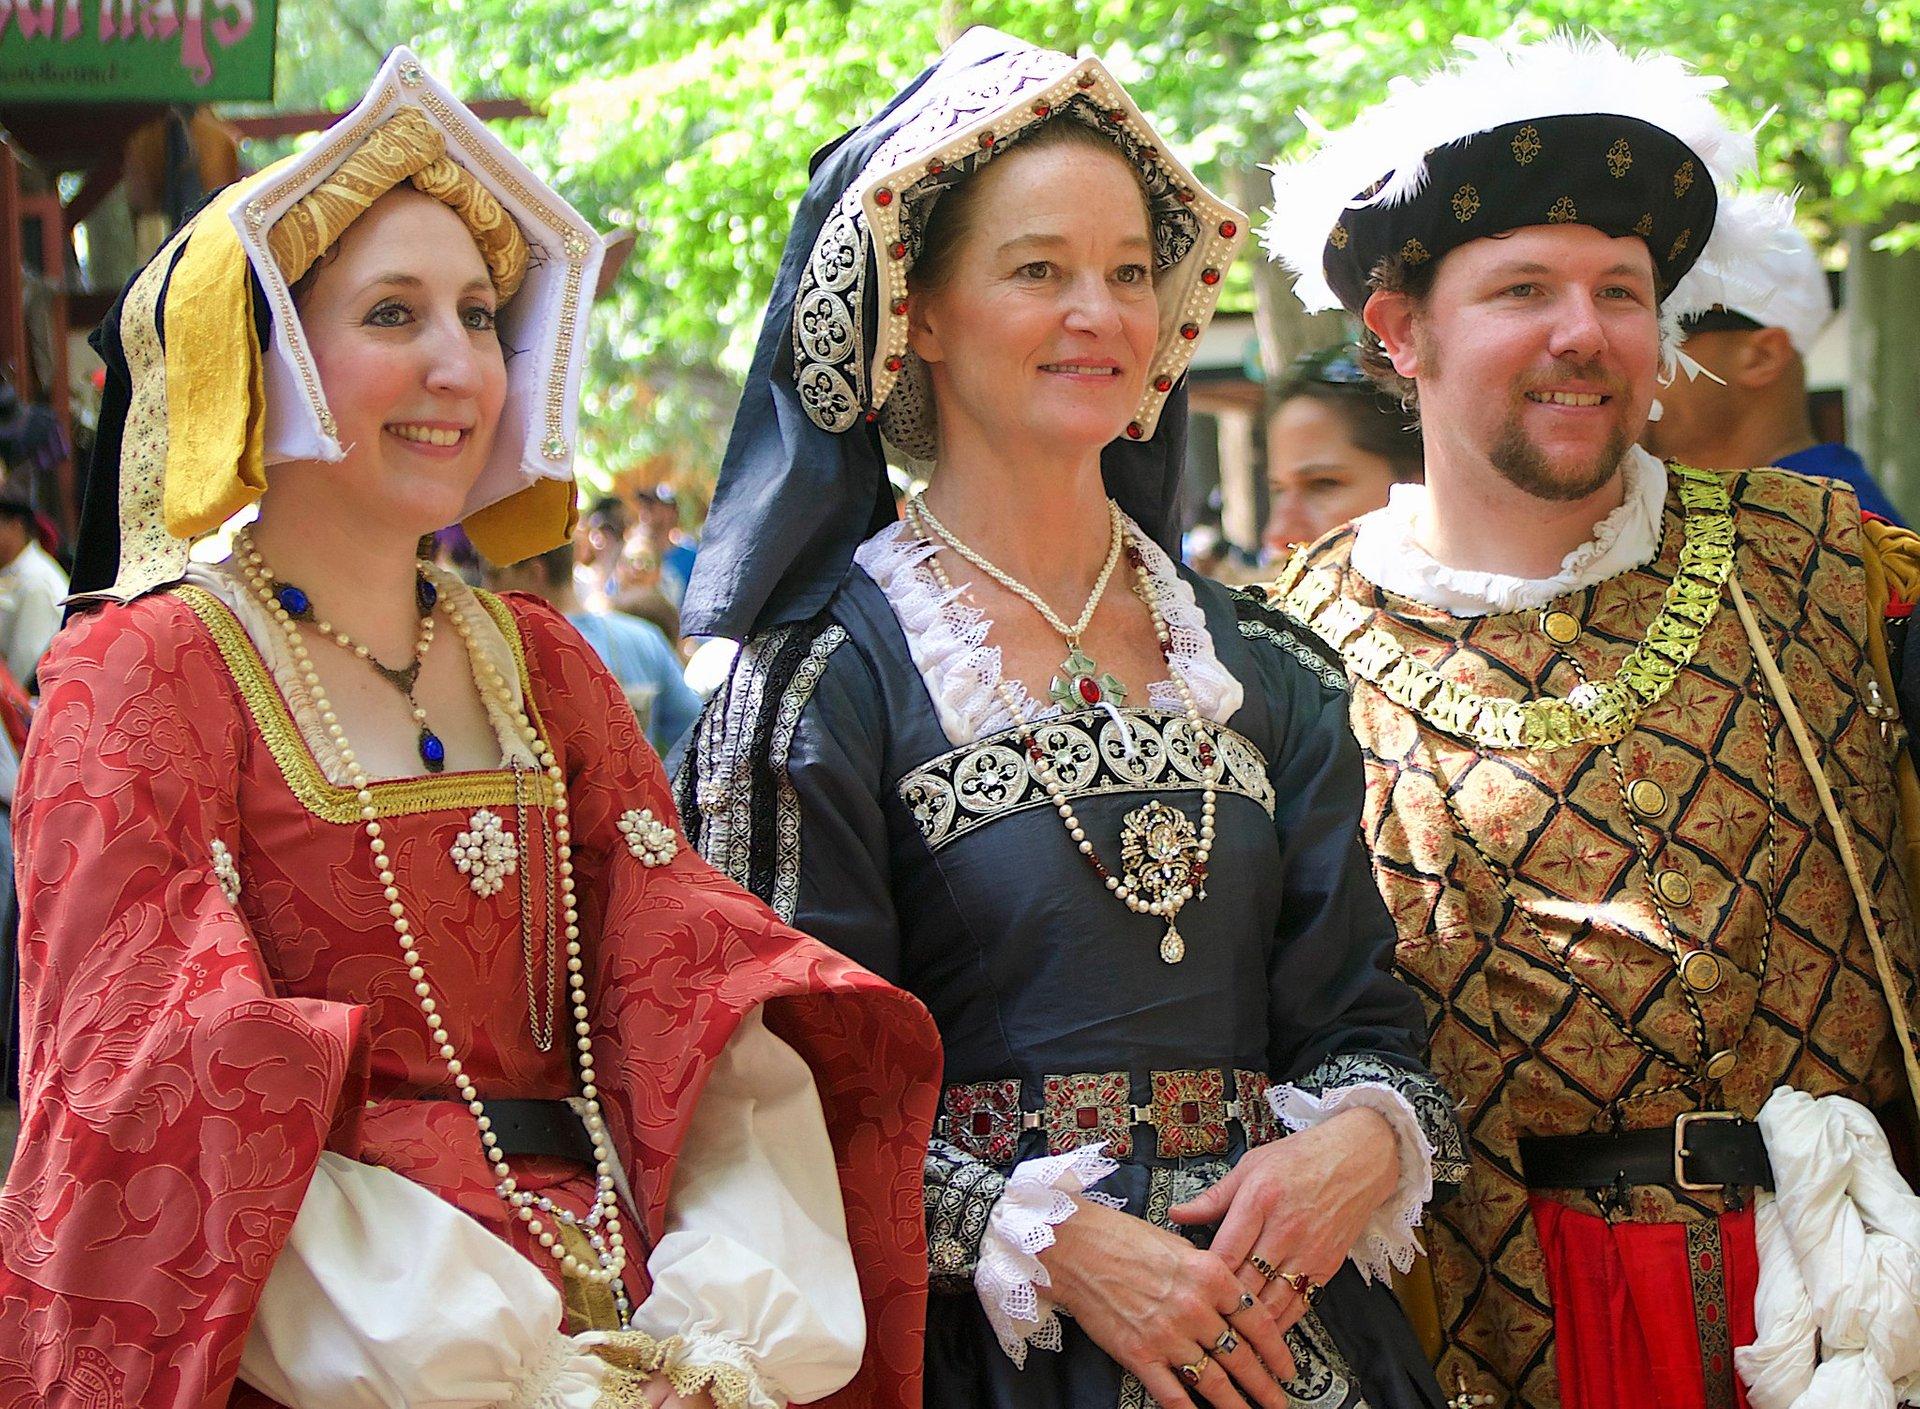 Maryland Renaissance Festival 2020